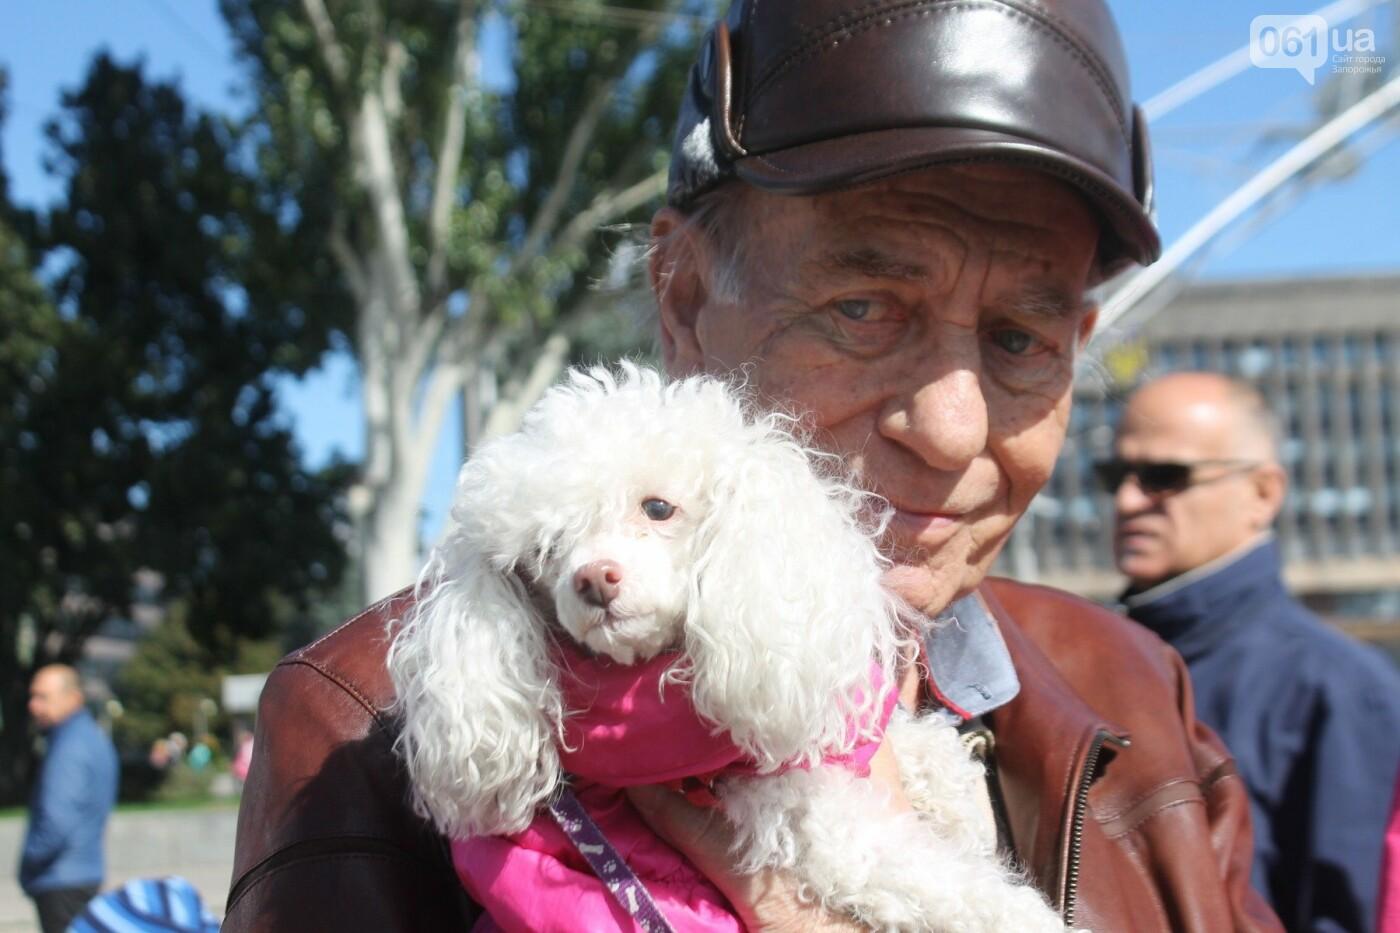 «Защити! Не мучай»: в Запорожье провели марш за права животных, – ФОТОРЕПОРТАЖ, ВИДЕО, фото-10